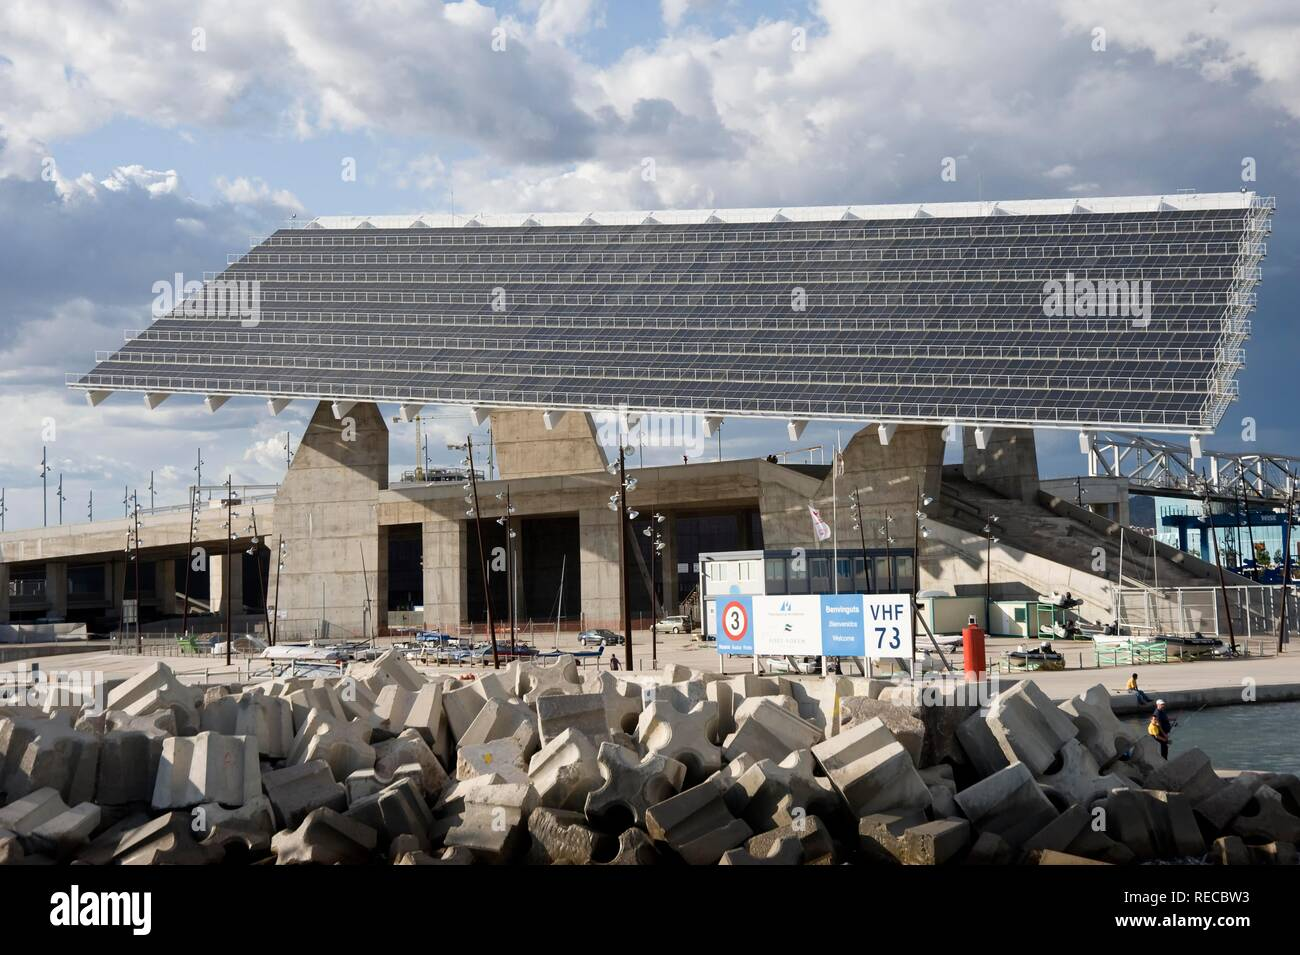 Photovoltaic pergola, Diagonal Mar, Waterfront, Barcelona, Catalonia, Spain, Europe Stock Photo